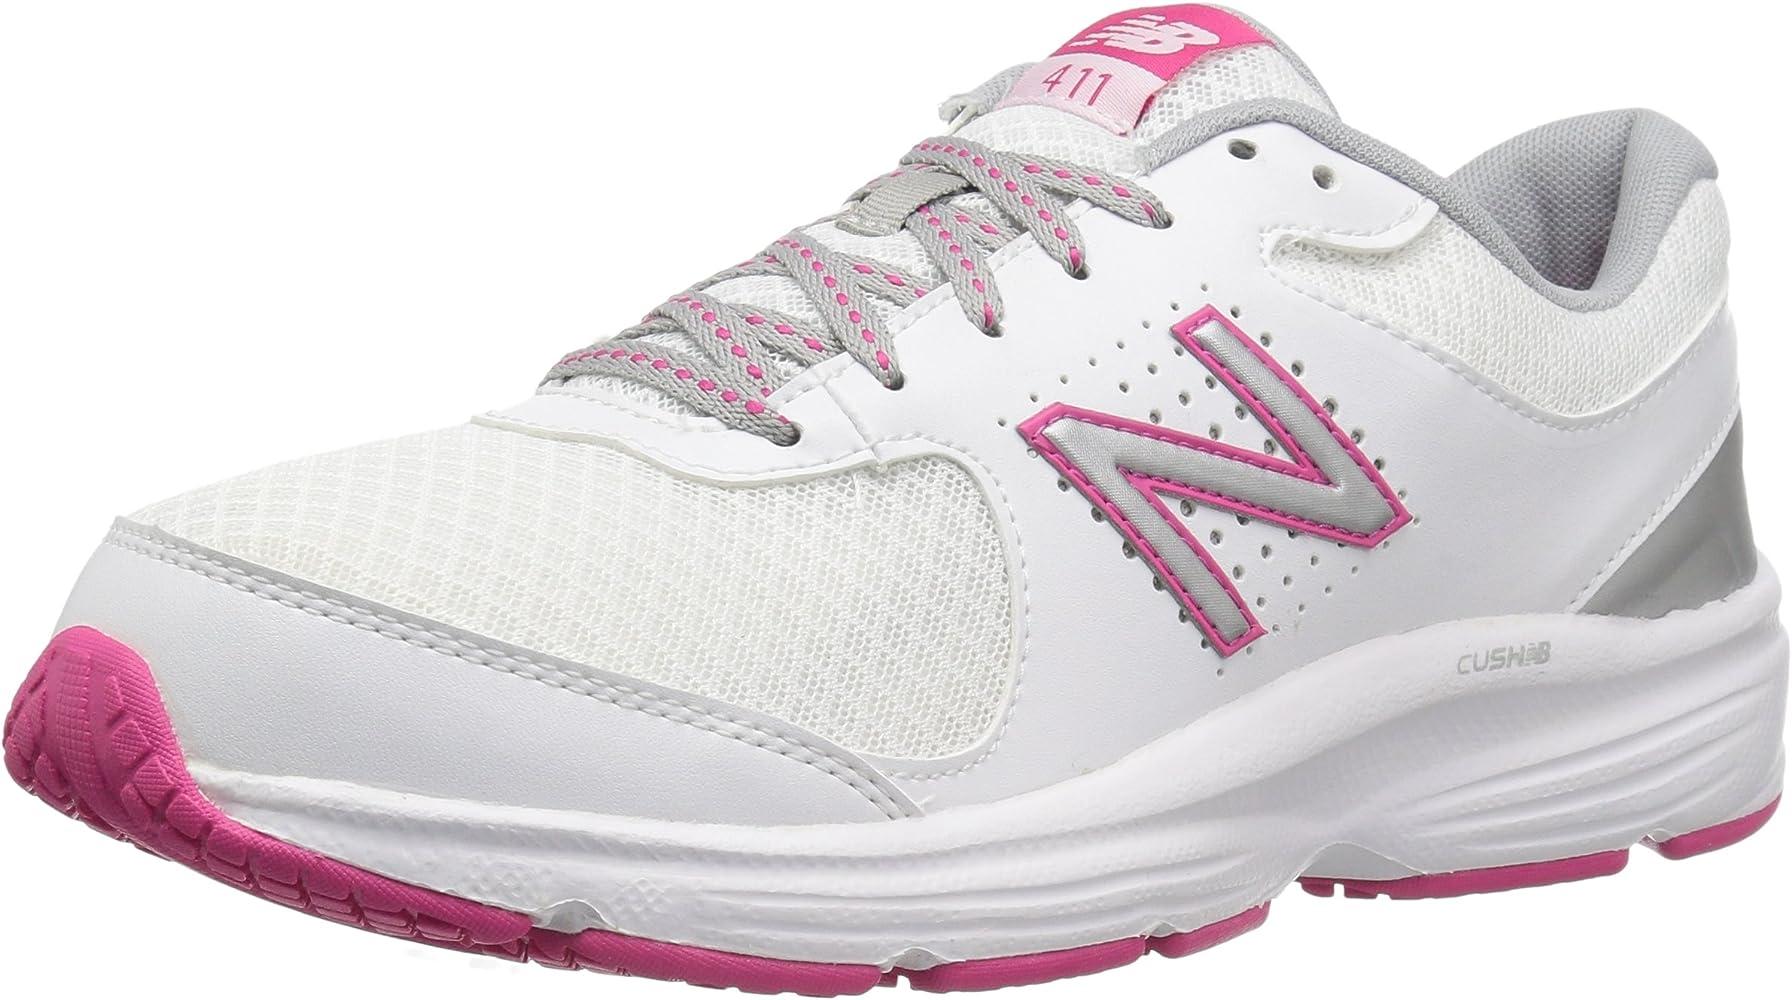 episodio para justificar ratón o rata  Amazon.com | New Balance Women's 411 V2 Walking Shoe, White/Pink, 7.5 B US  | Walking